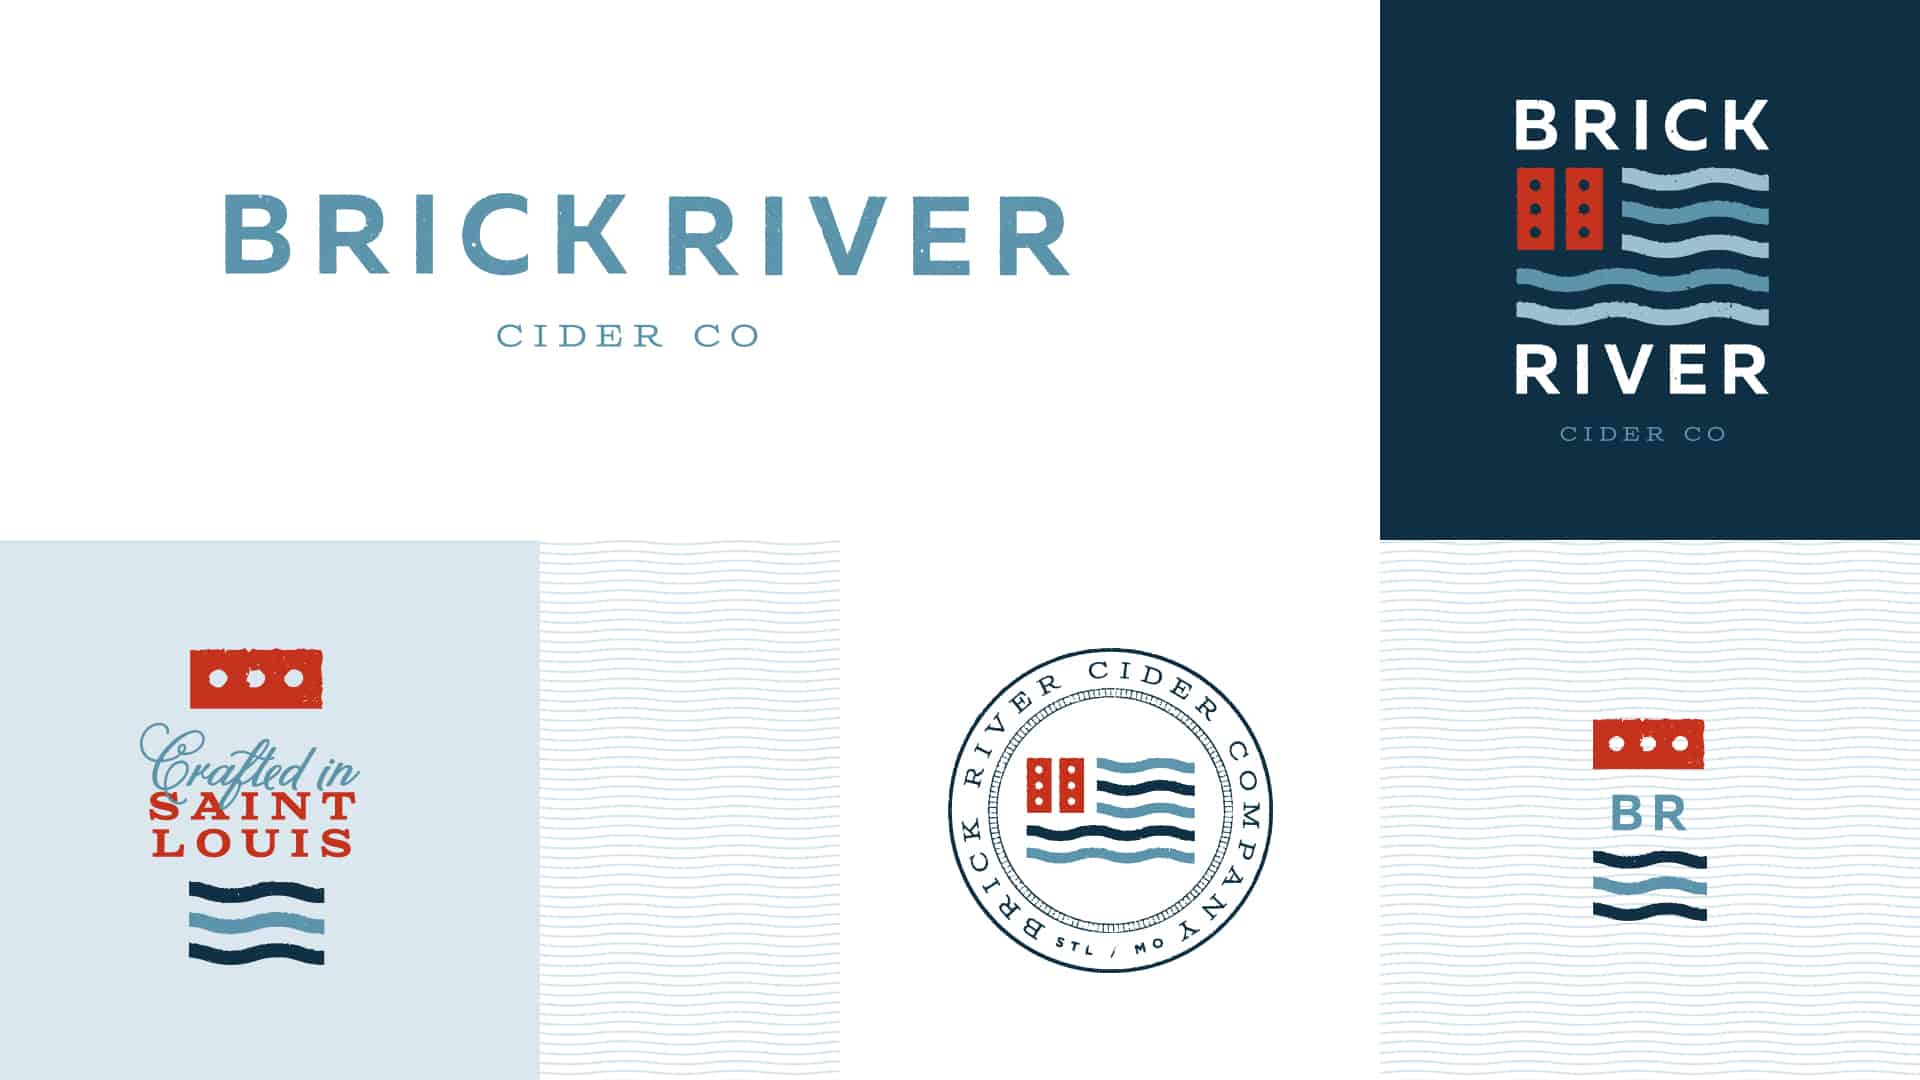 Brick River Cider co branding and brand identity design